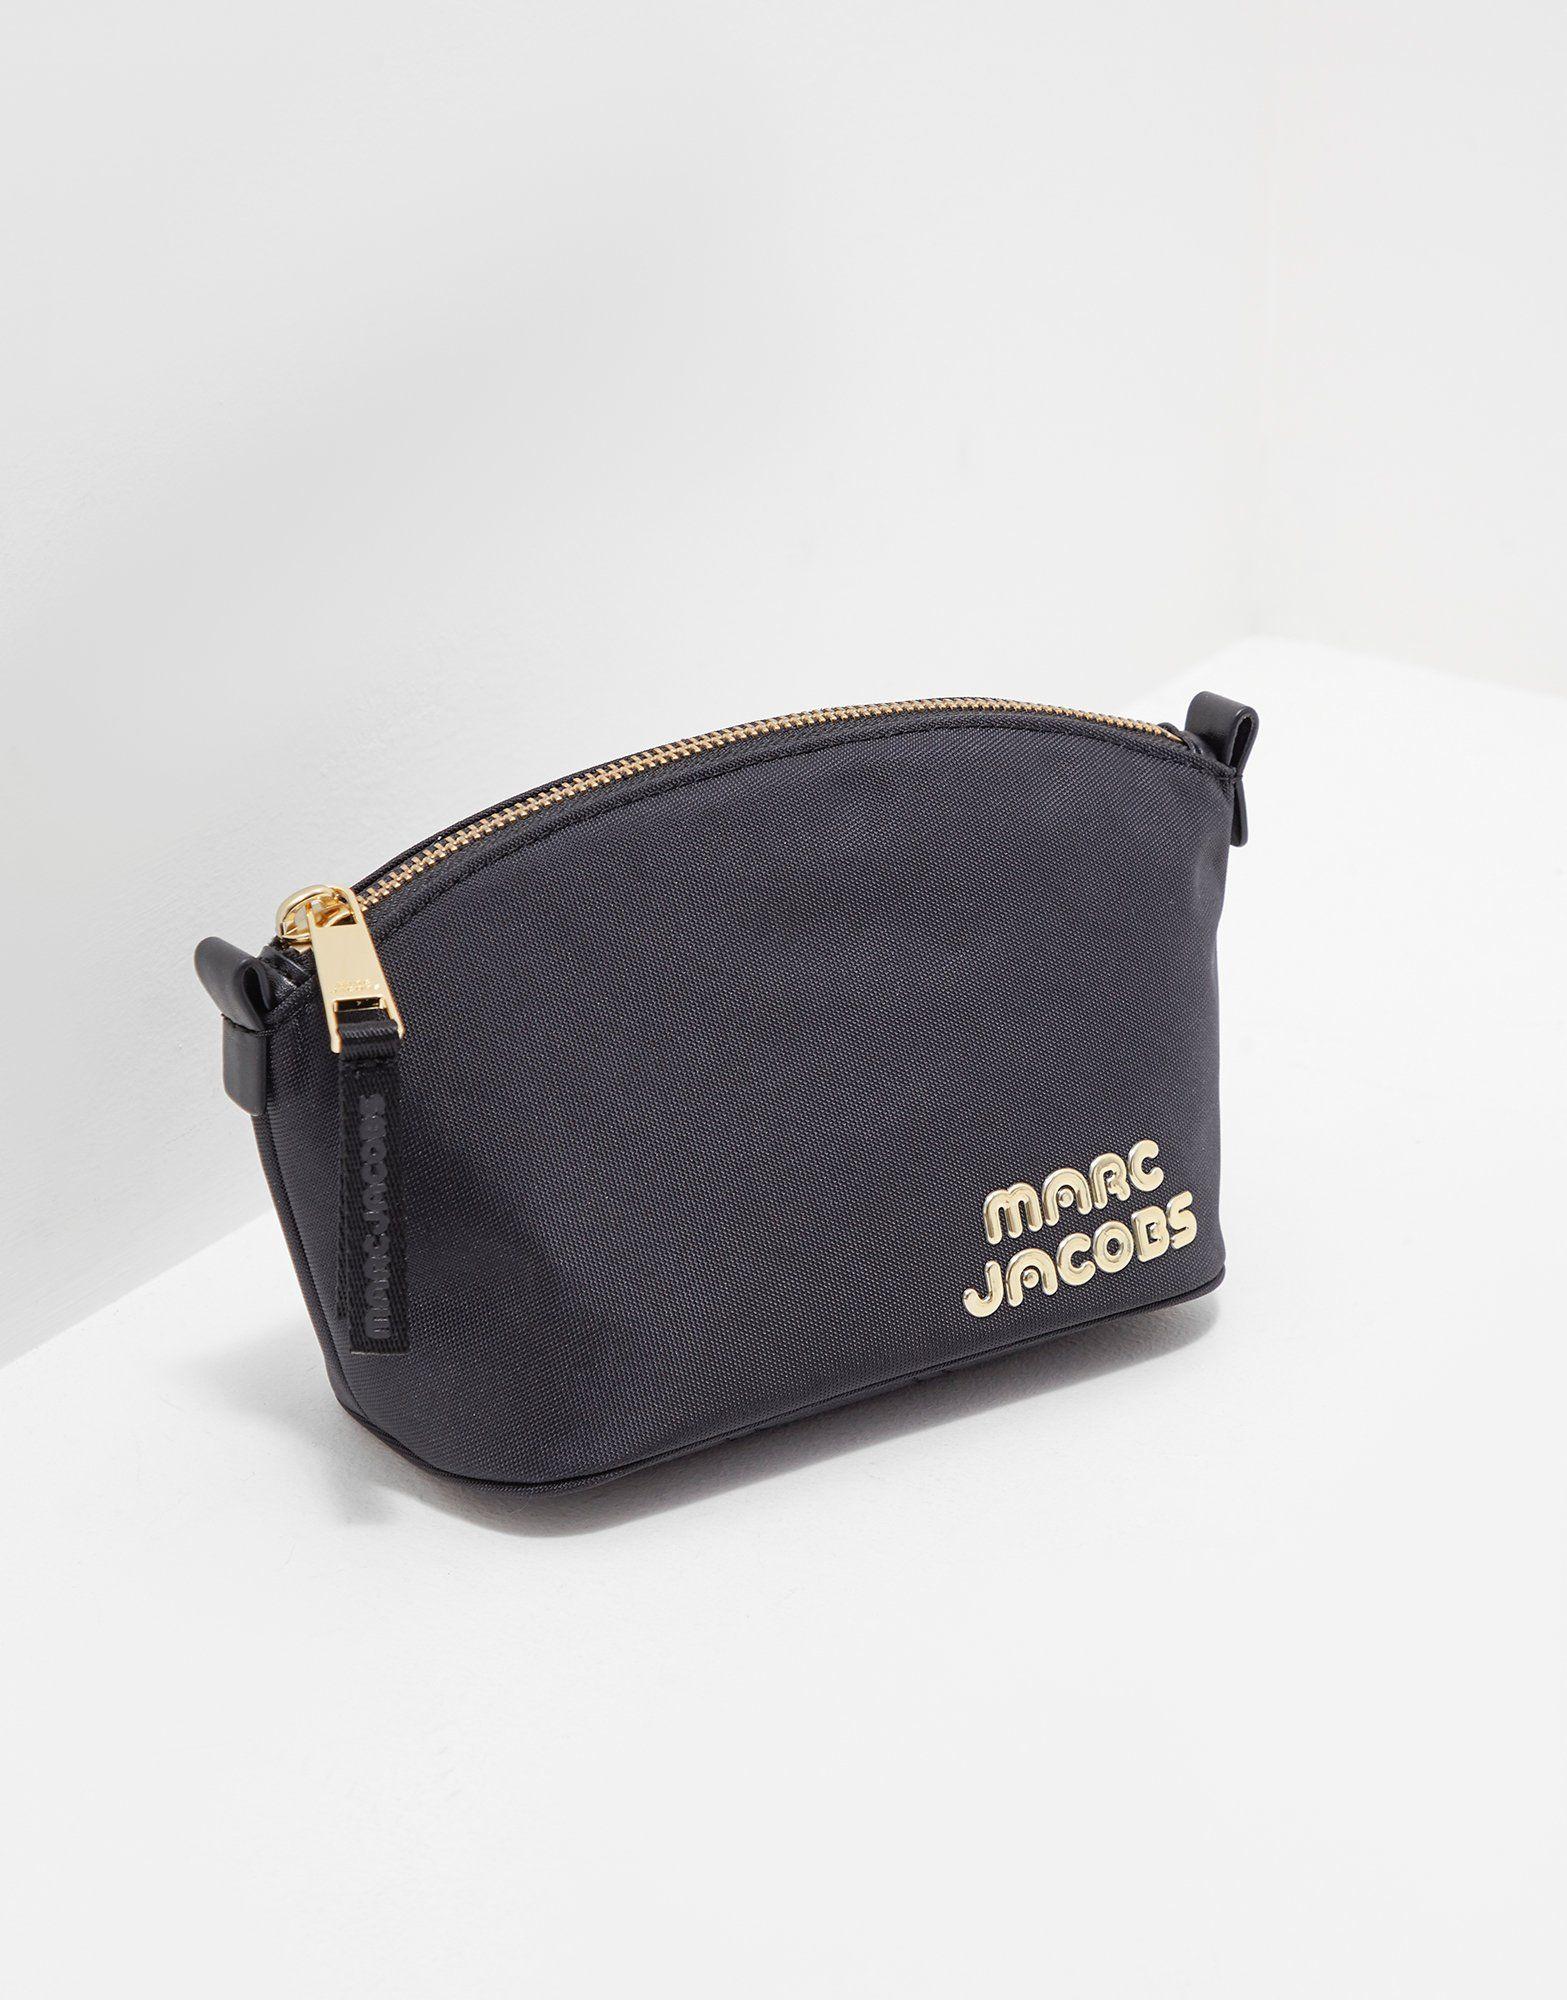 Marc Jacobs Compact Bag - Online Exclusive